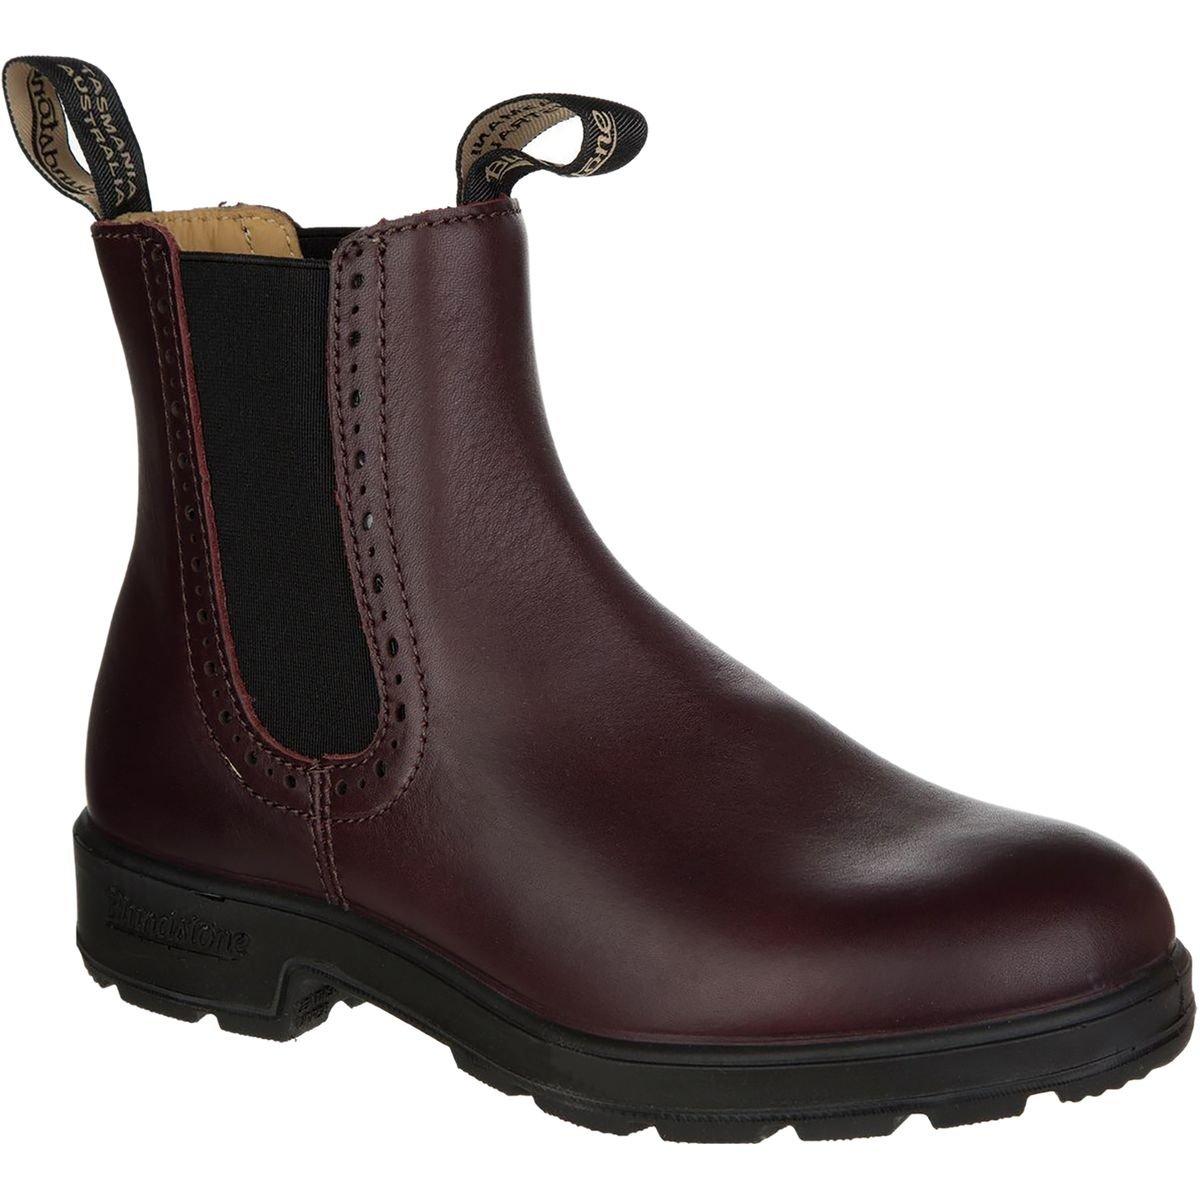 Blundstone Women's 1352 Chelsea Boot B01ATP8M0K 8 UK/11 M US|Shiraz